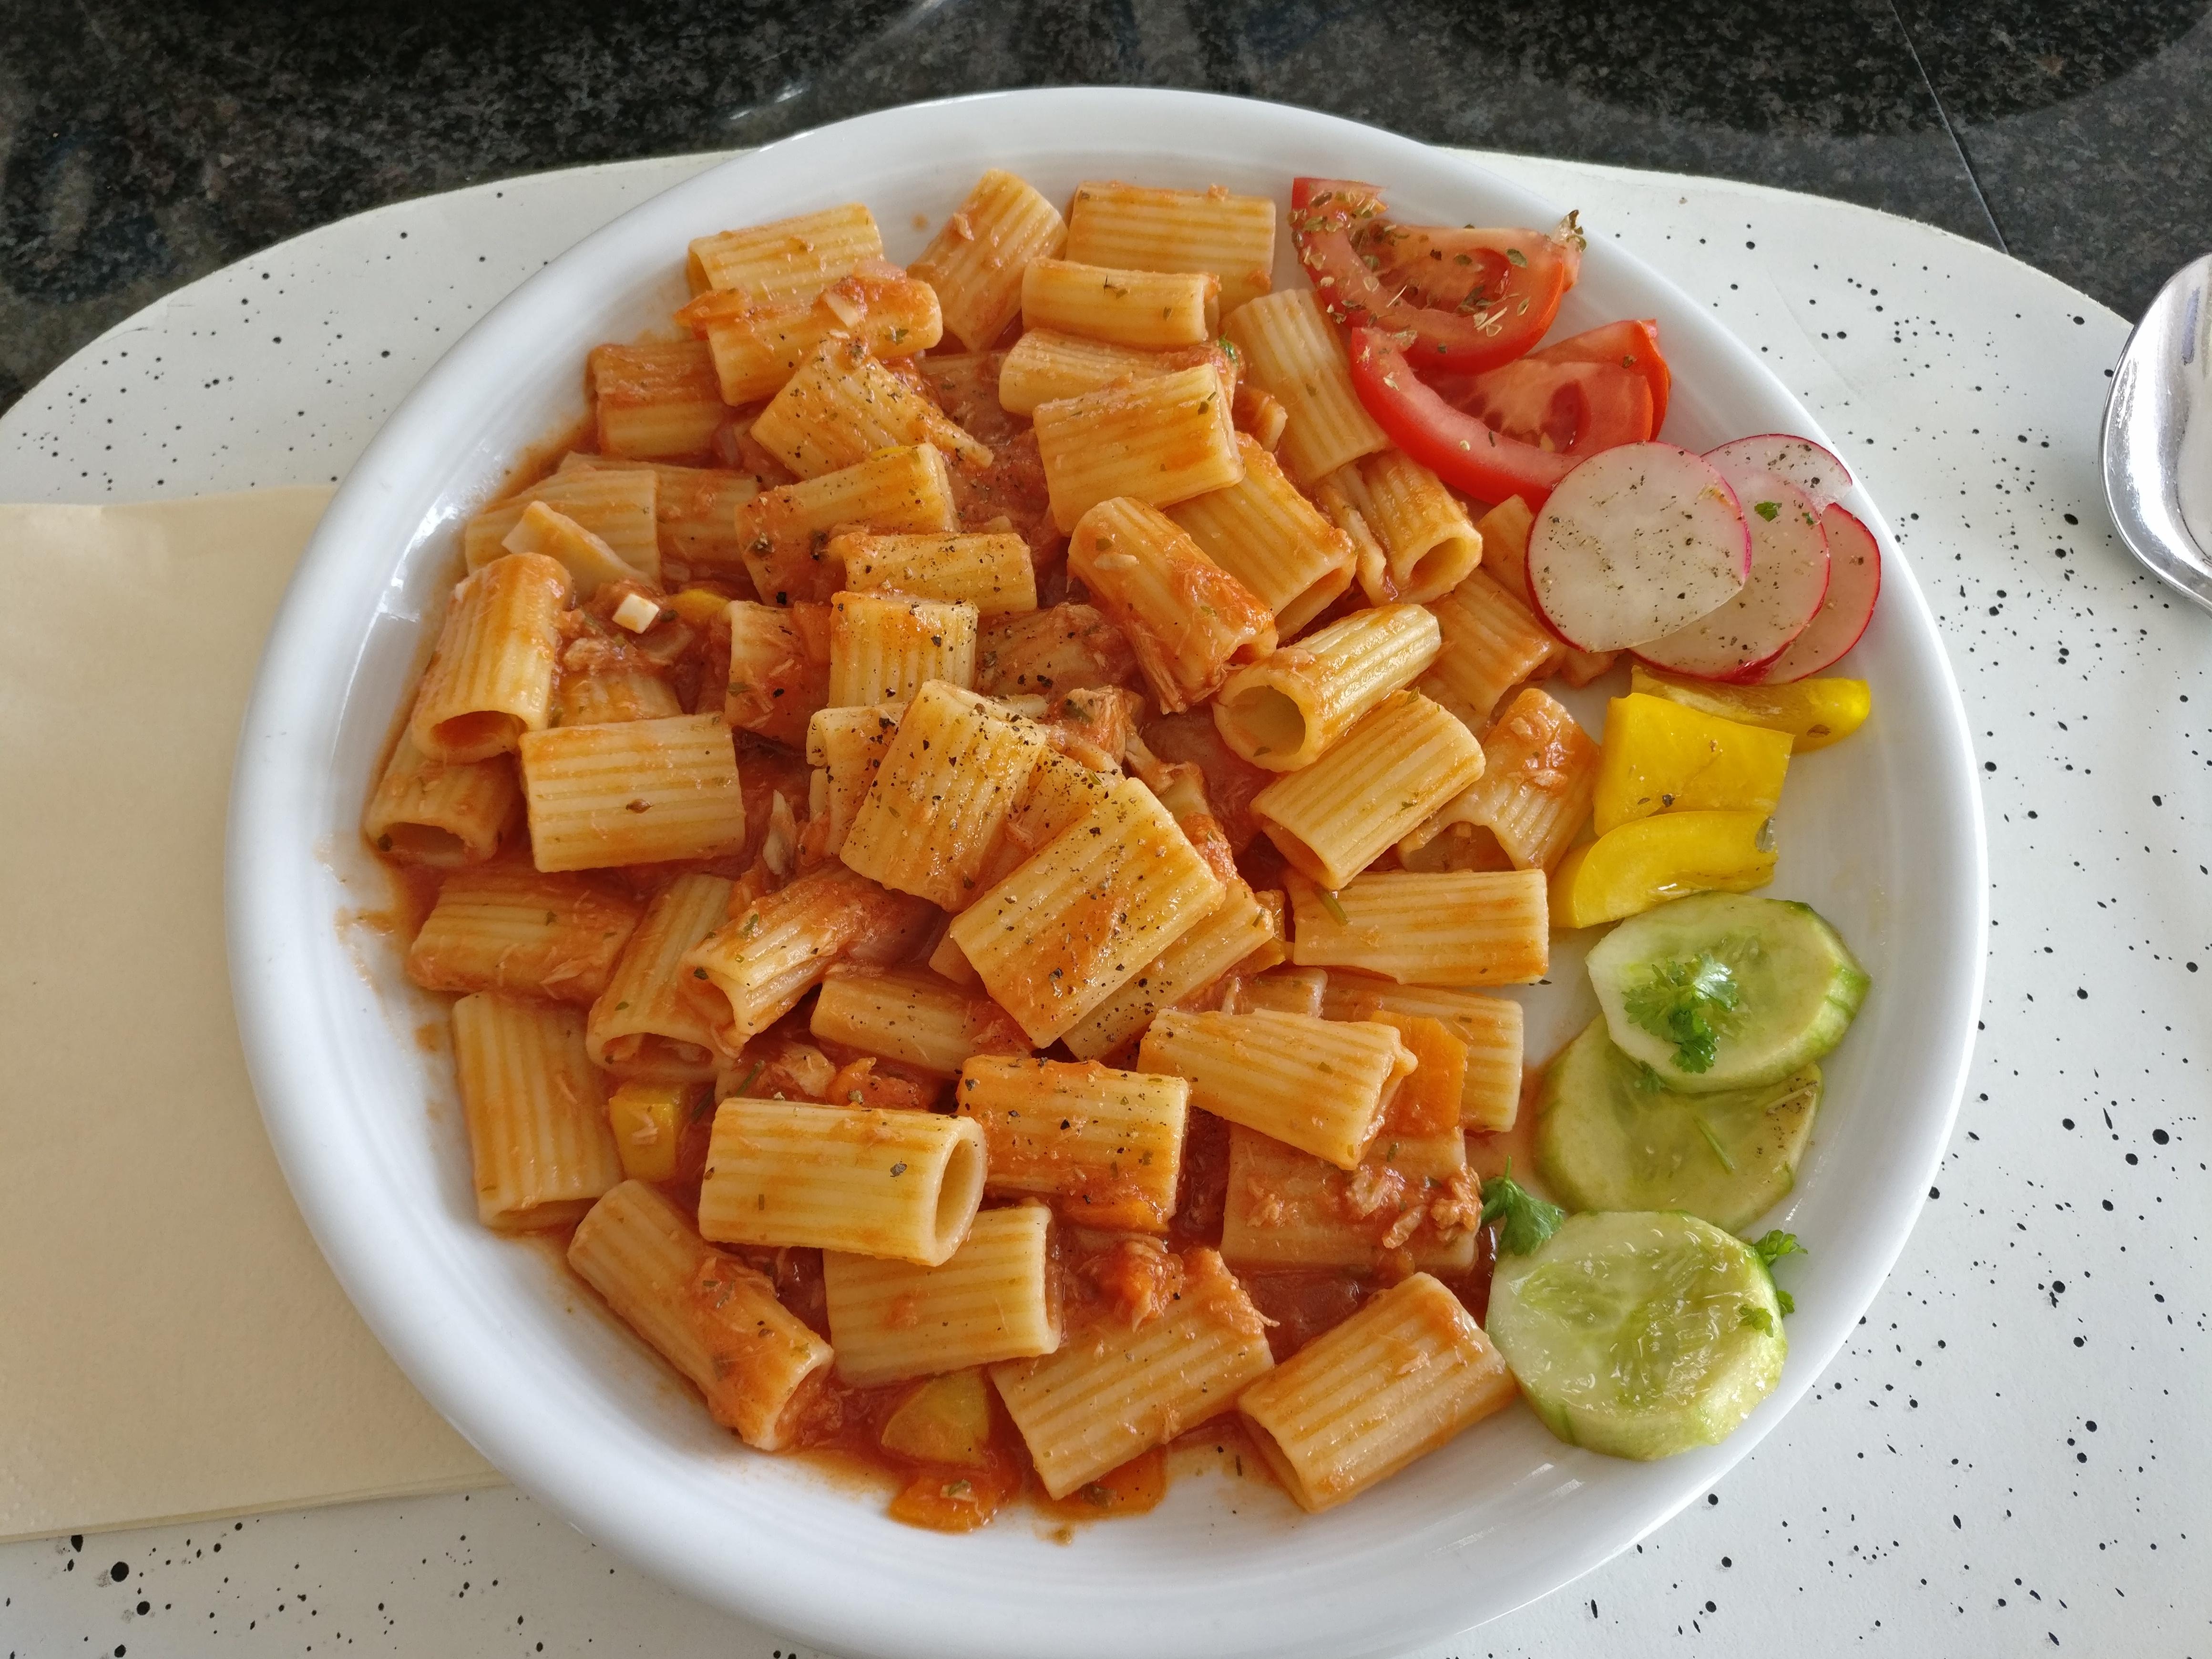 http://foodloader.net/nico_2017-04-08_nudeln-mit-thunfisch-tomaten-sauce.jpg